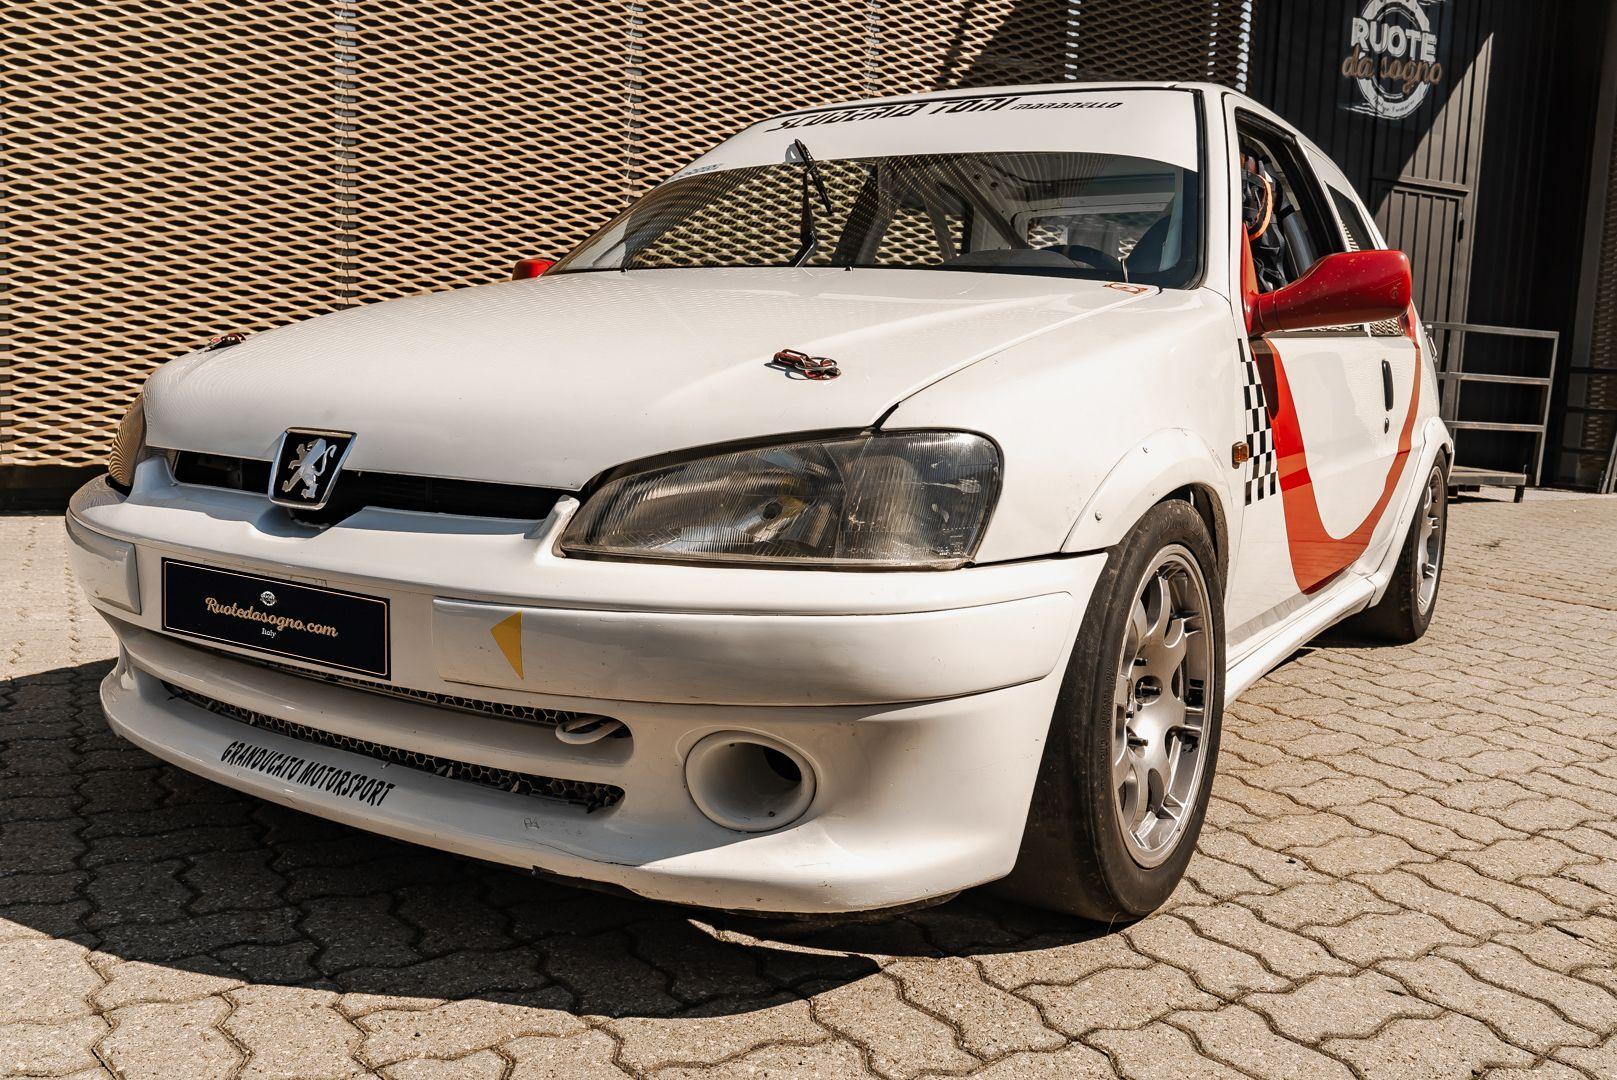 1998 Peugeot 106 Rallye S16 Group A 83073